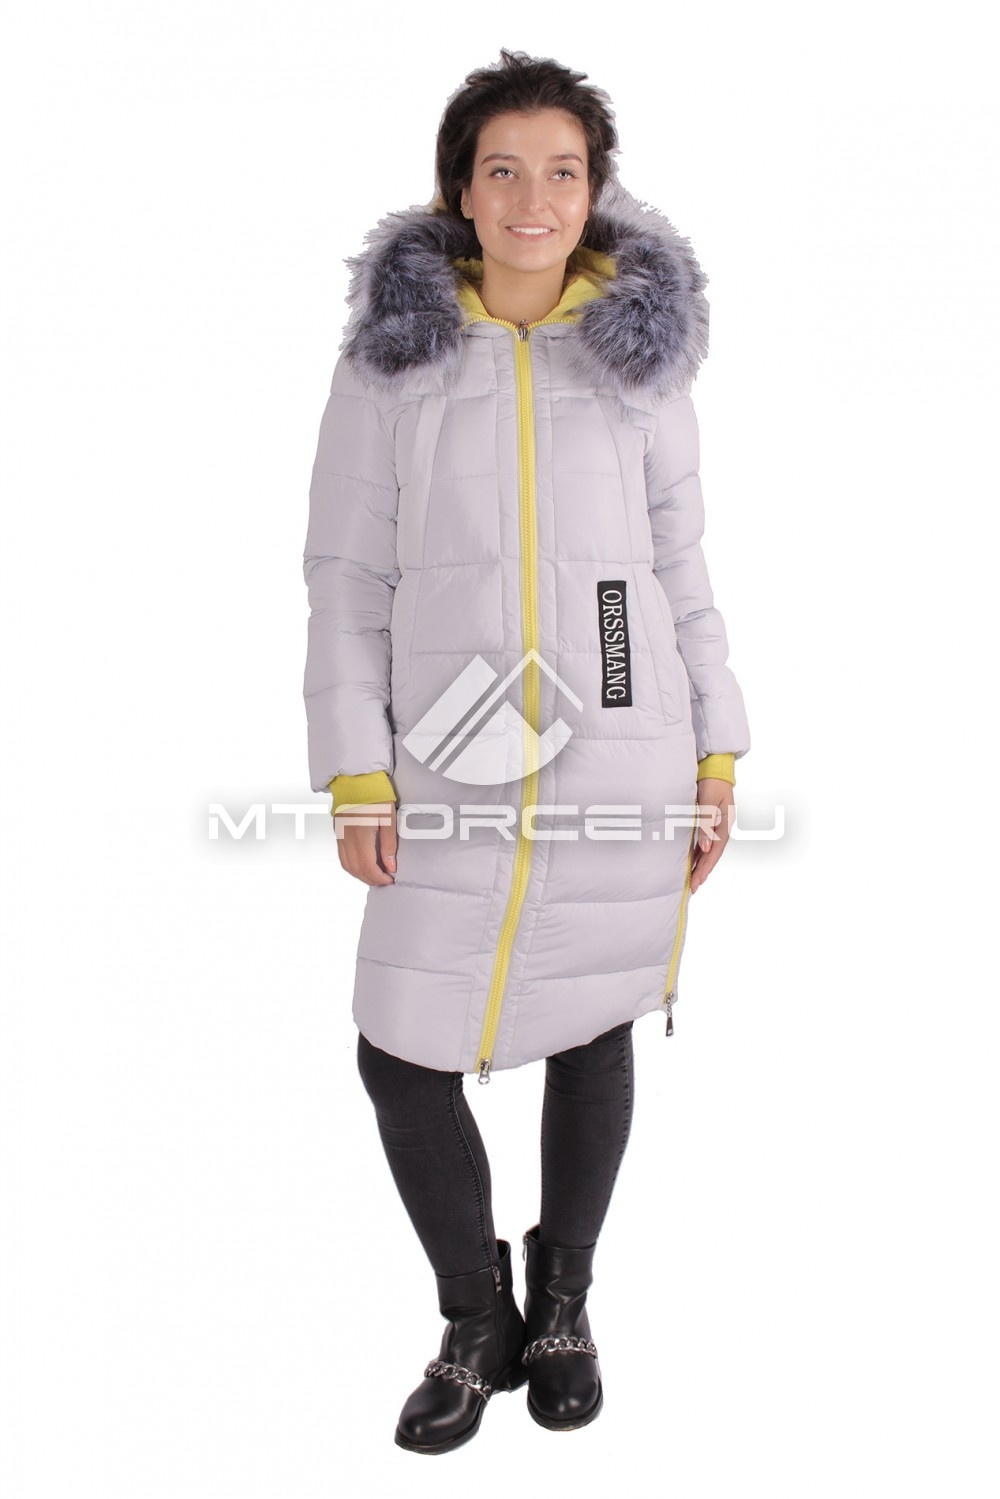 Купить оптом Пуховик ТРЕНД женский зимний серого цвета 16053Sr